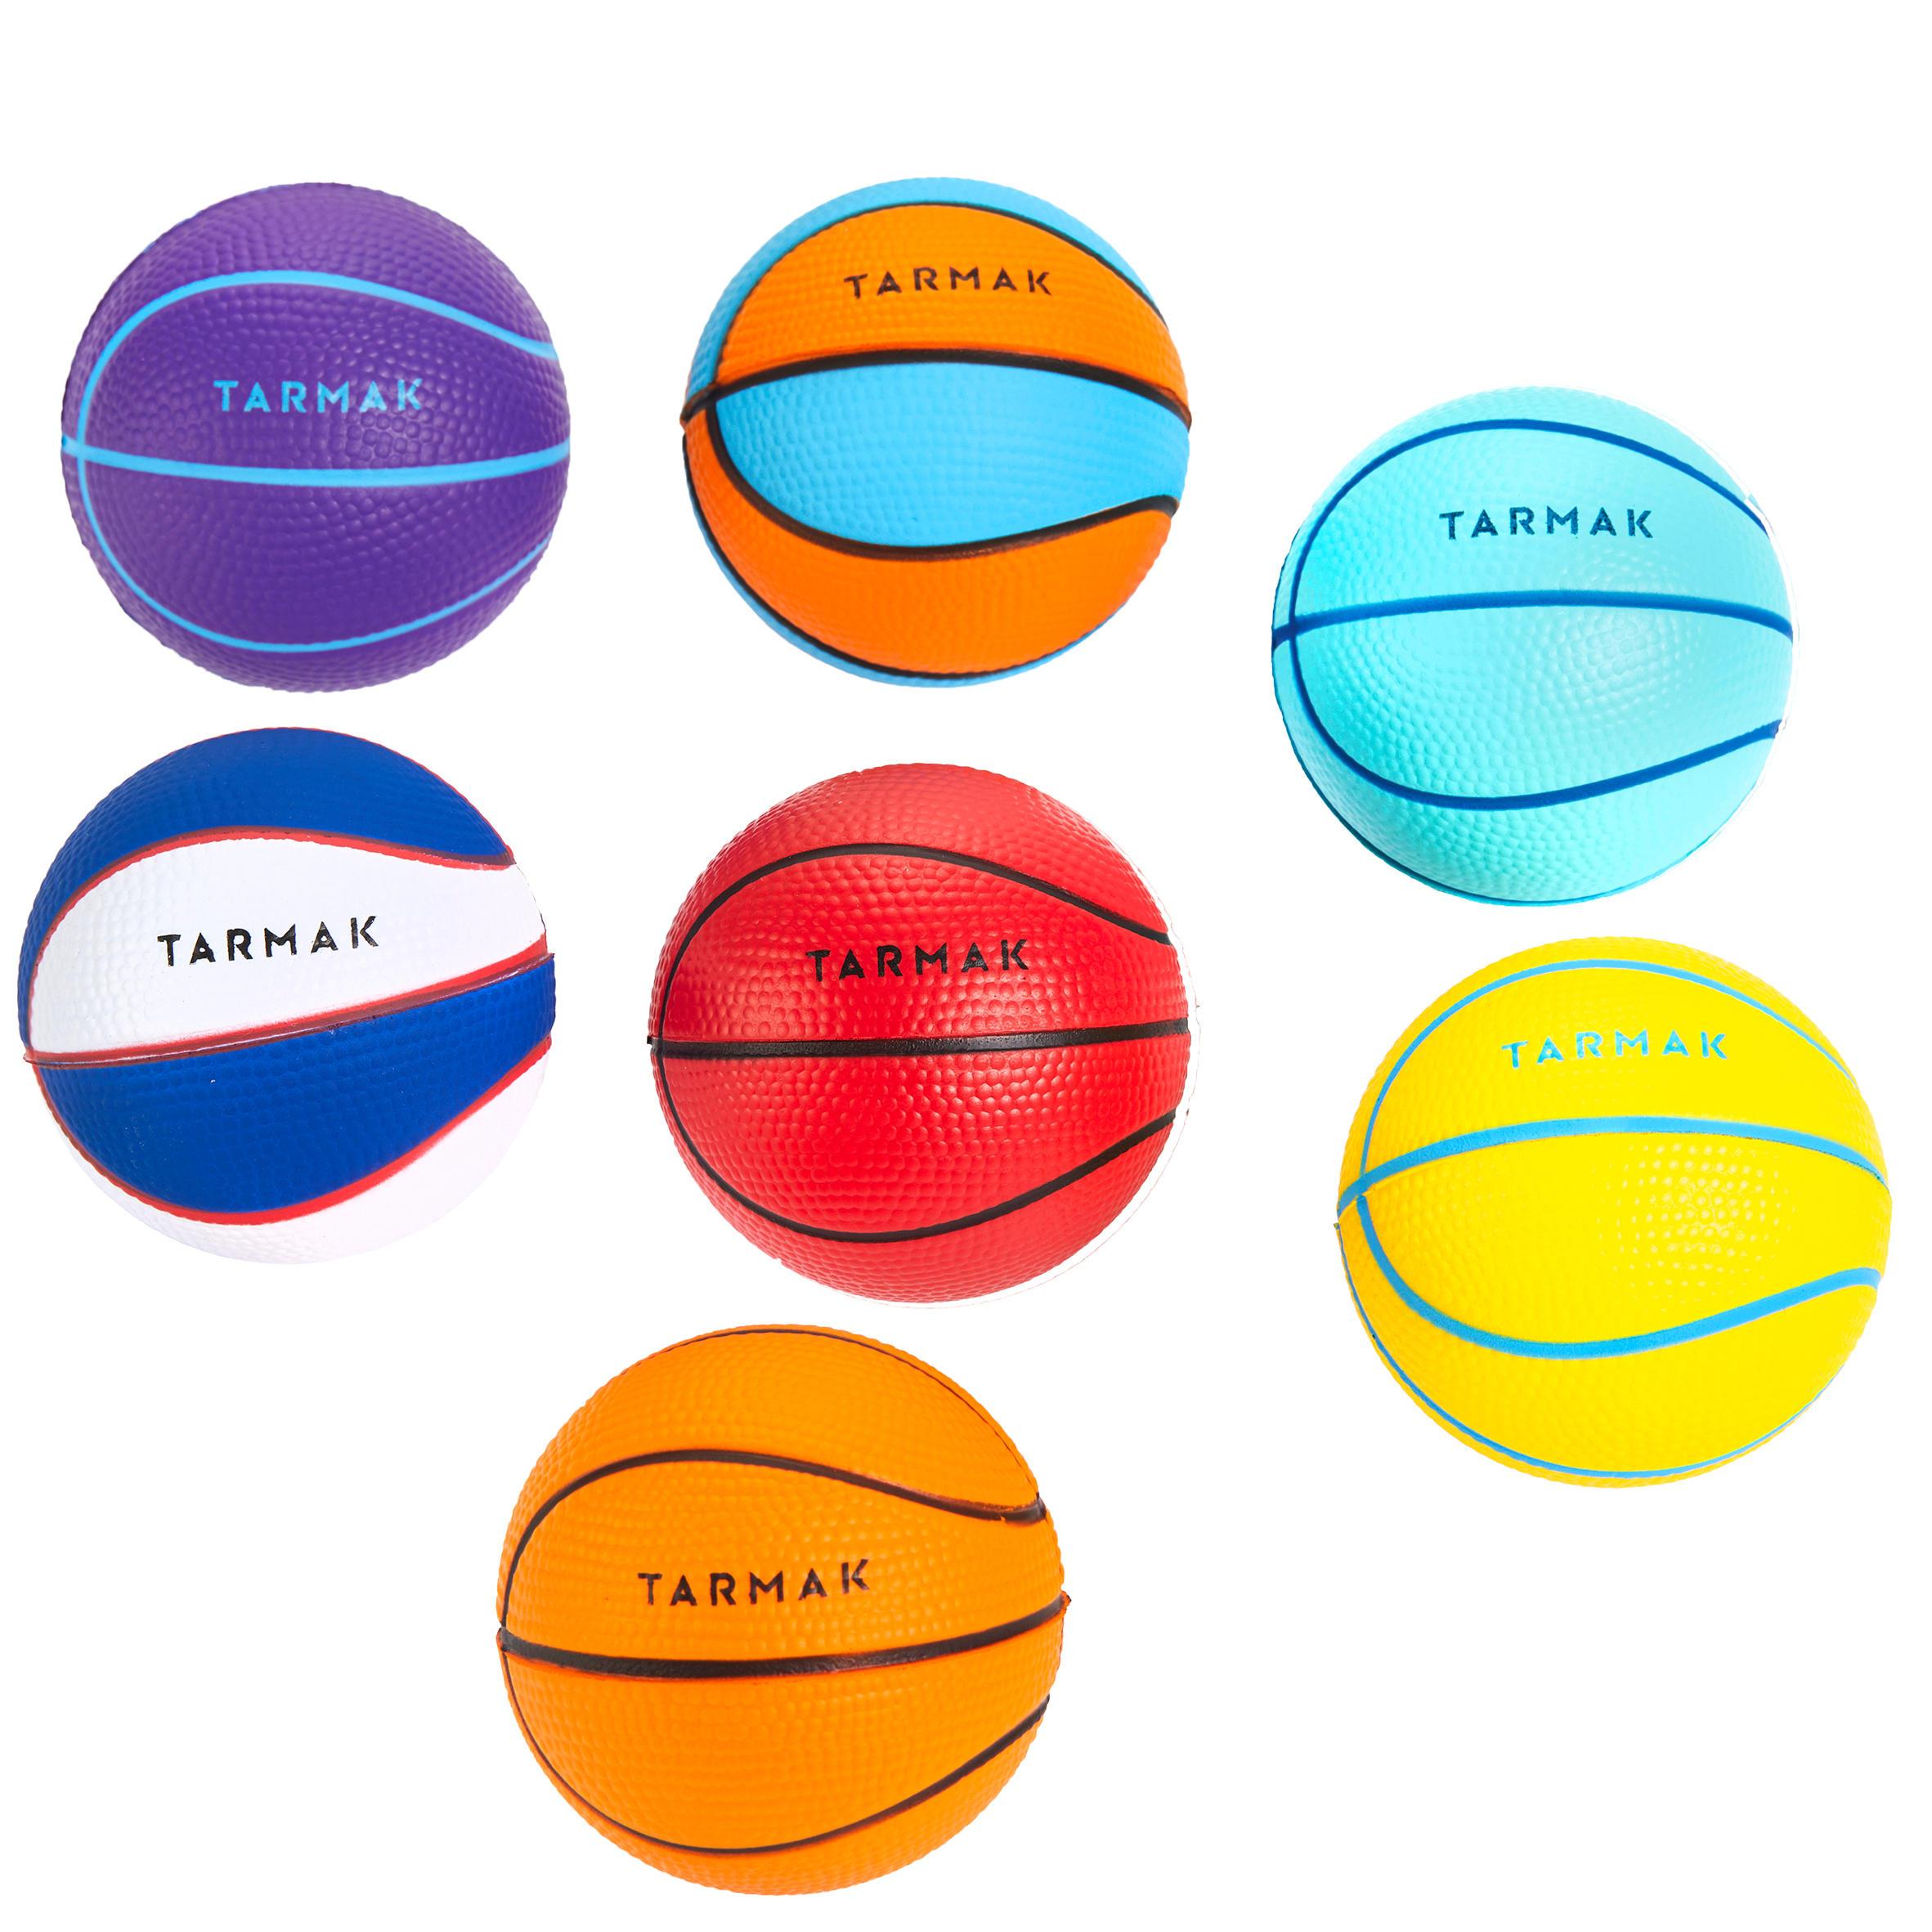 Tarmak Minibasketbal in schuimstof